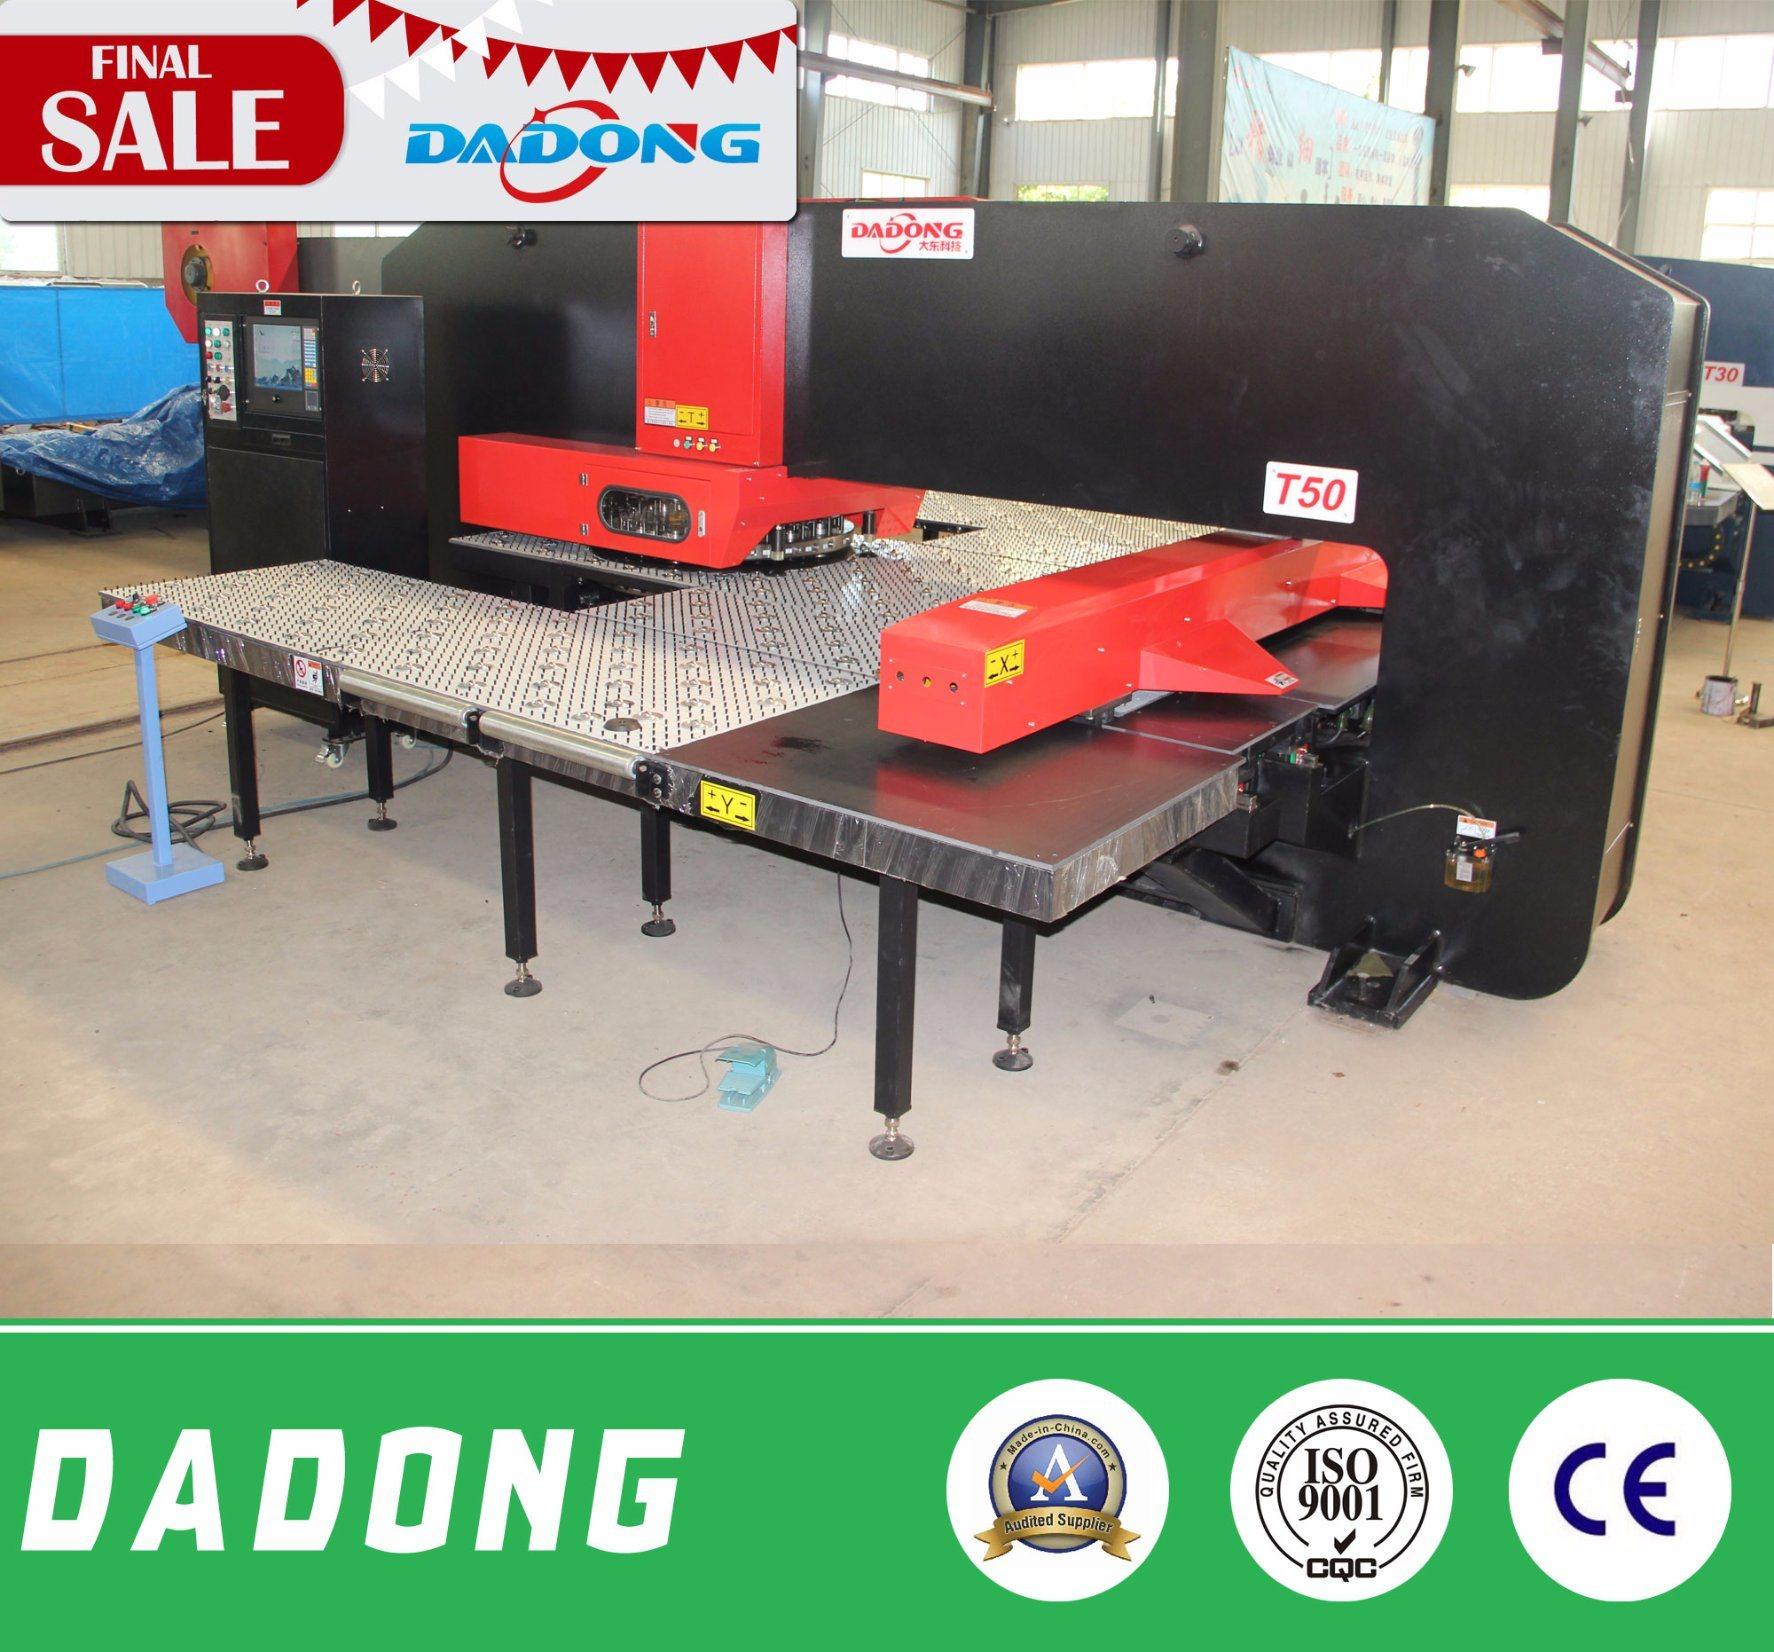 T50 CNC Heavy Duty Punching Machine